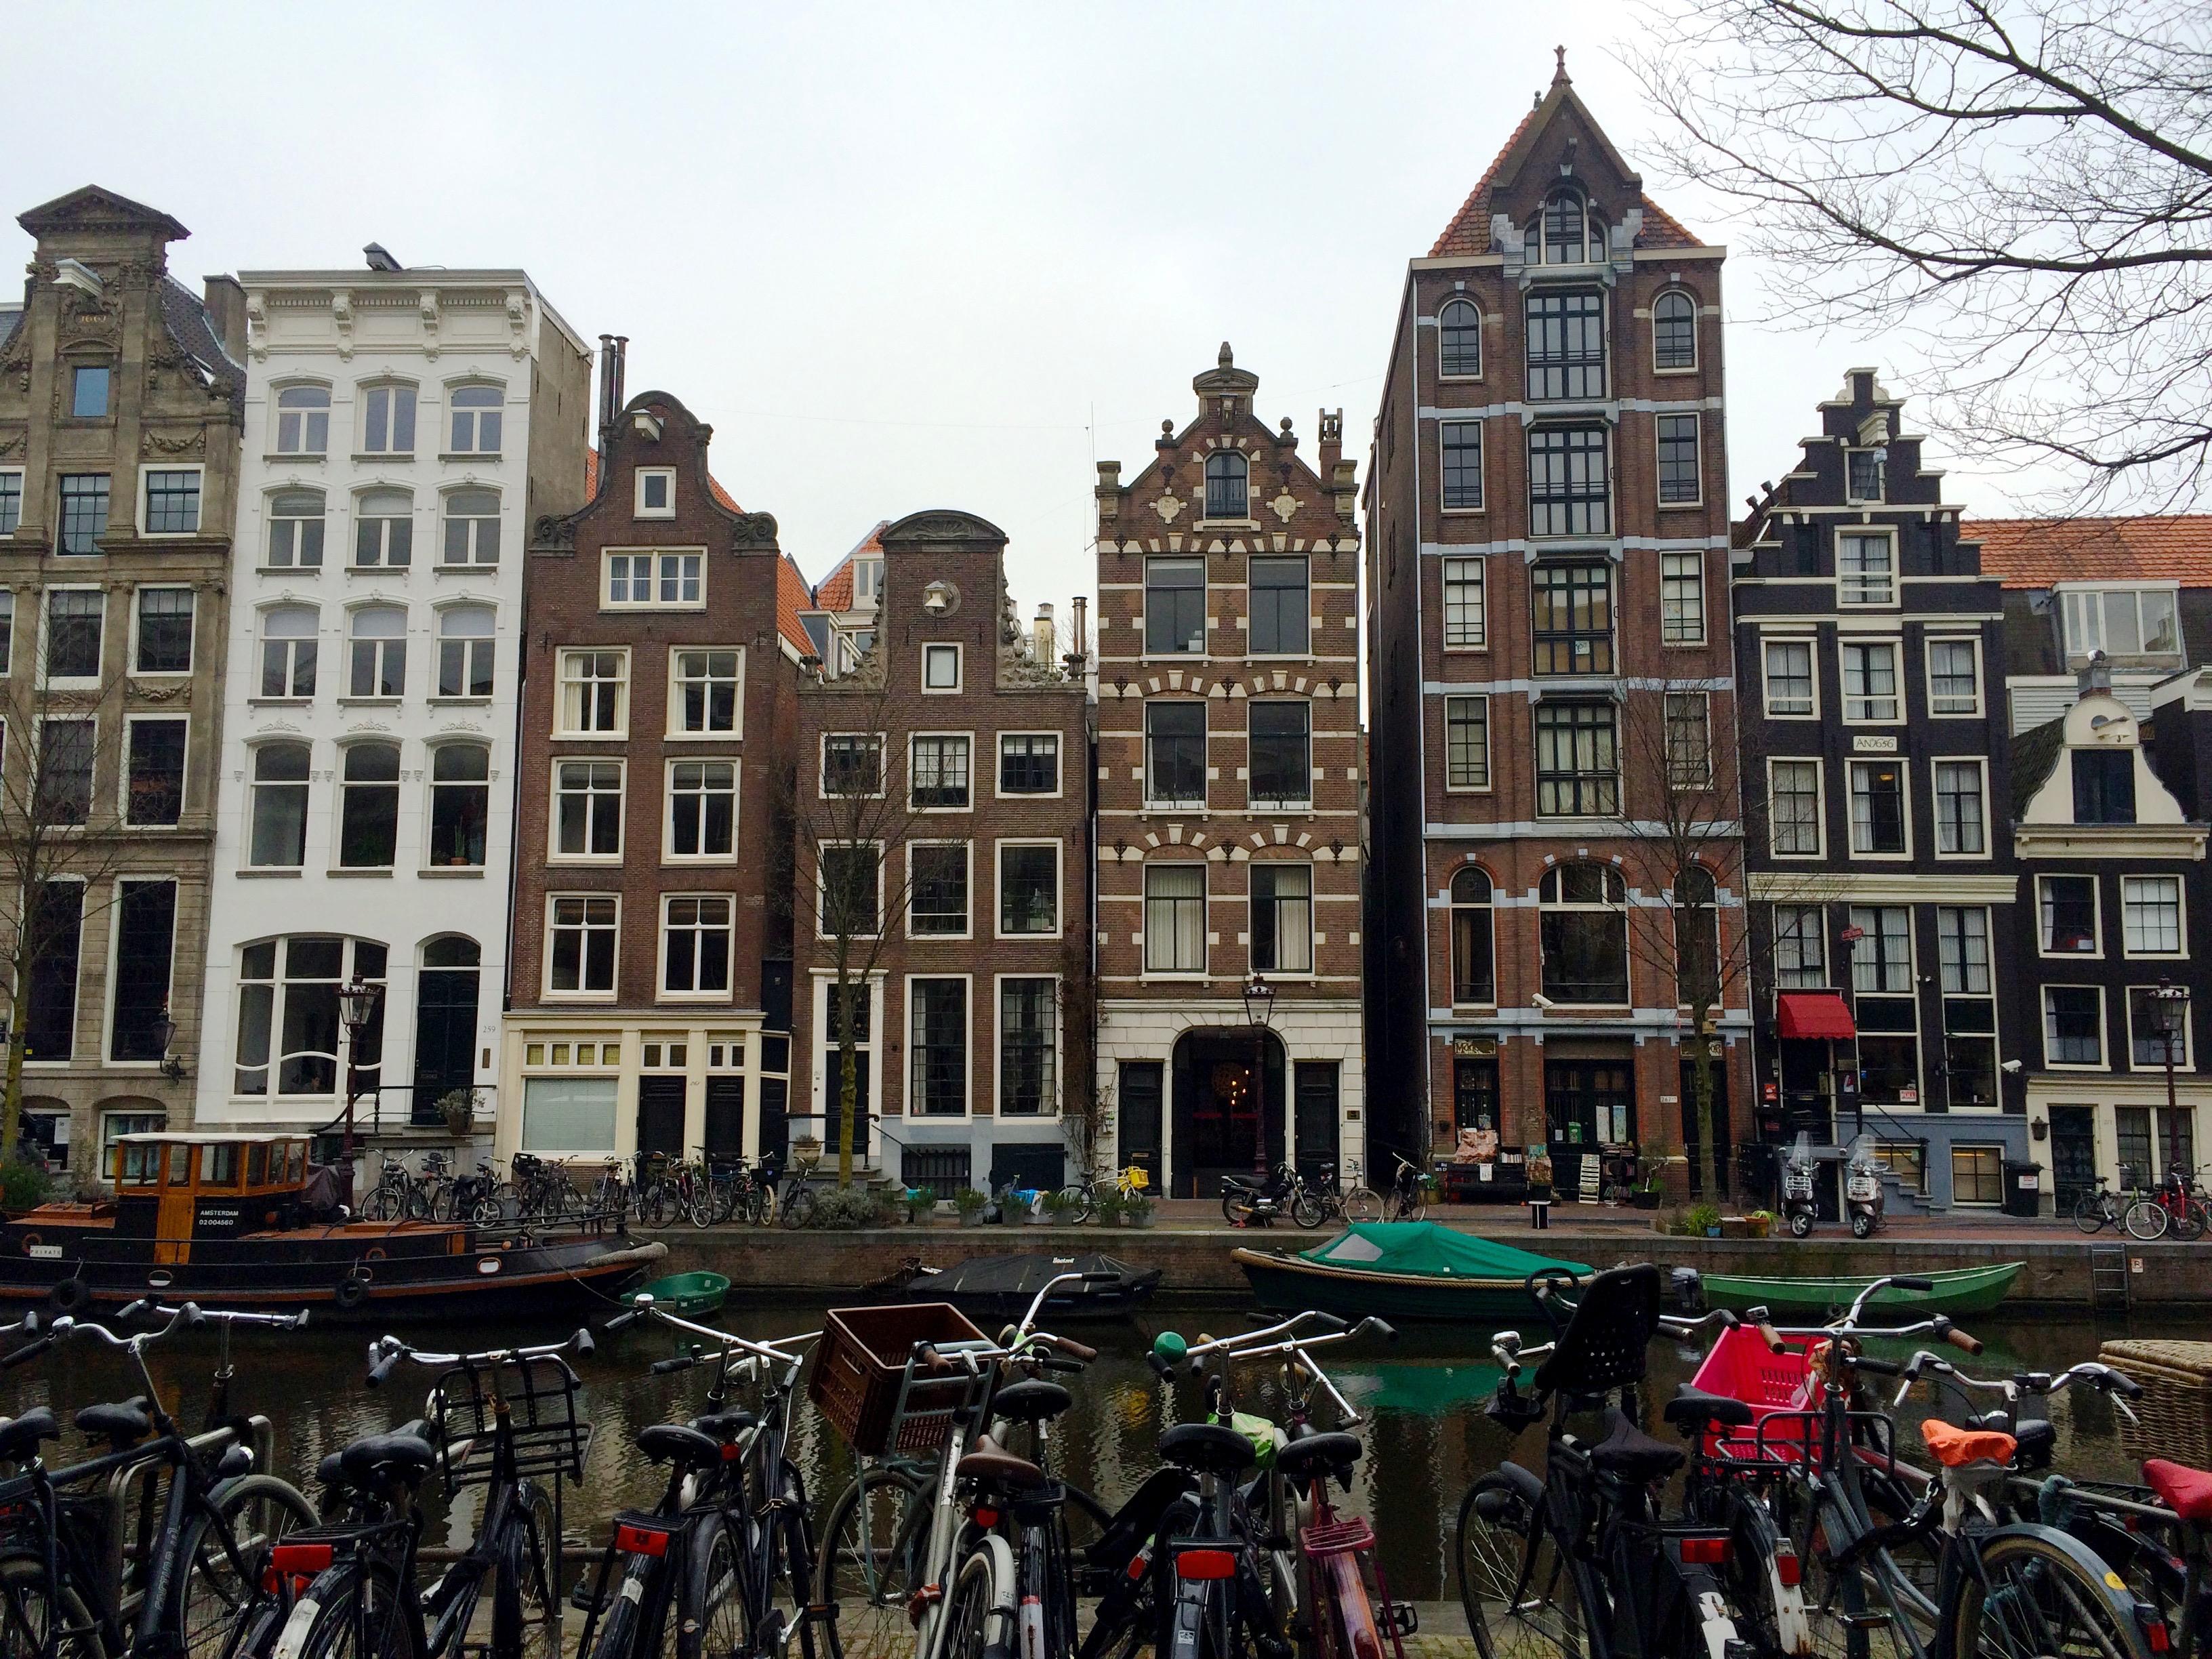 Classic Amsterdam homes